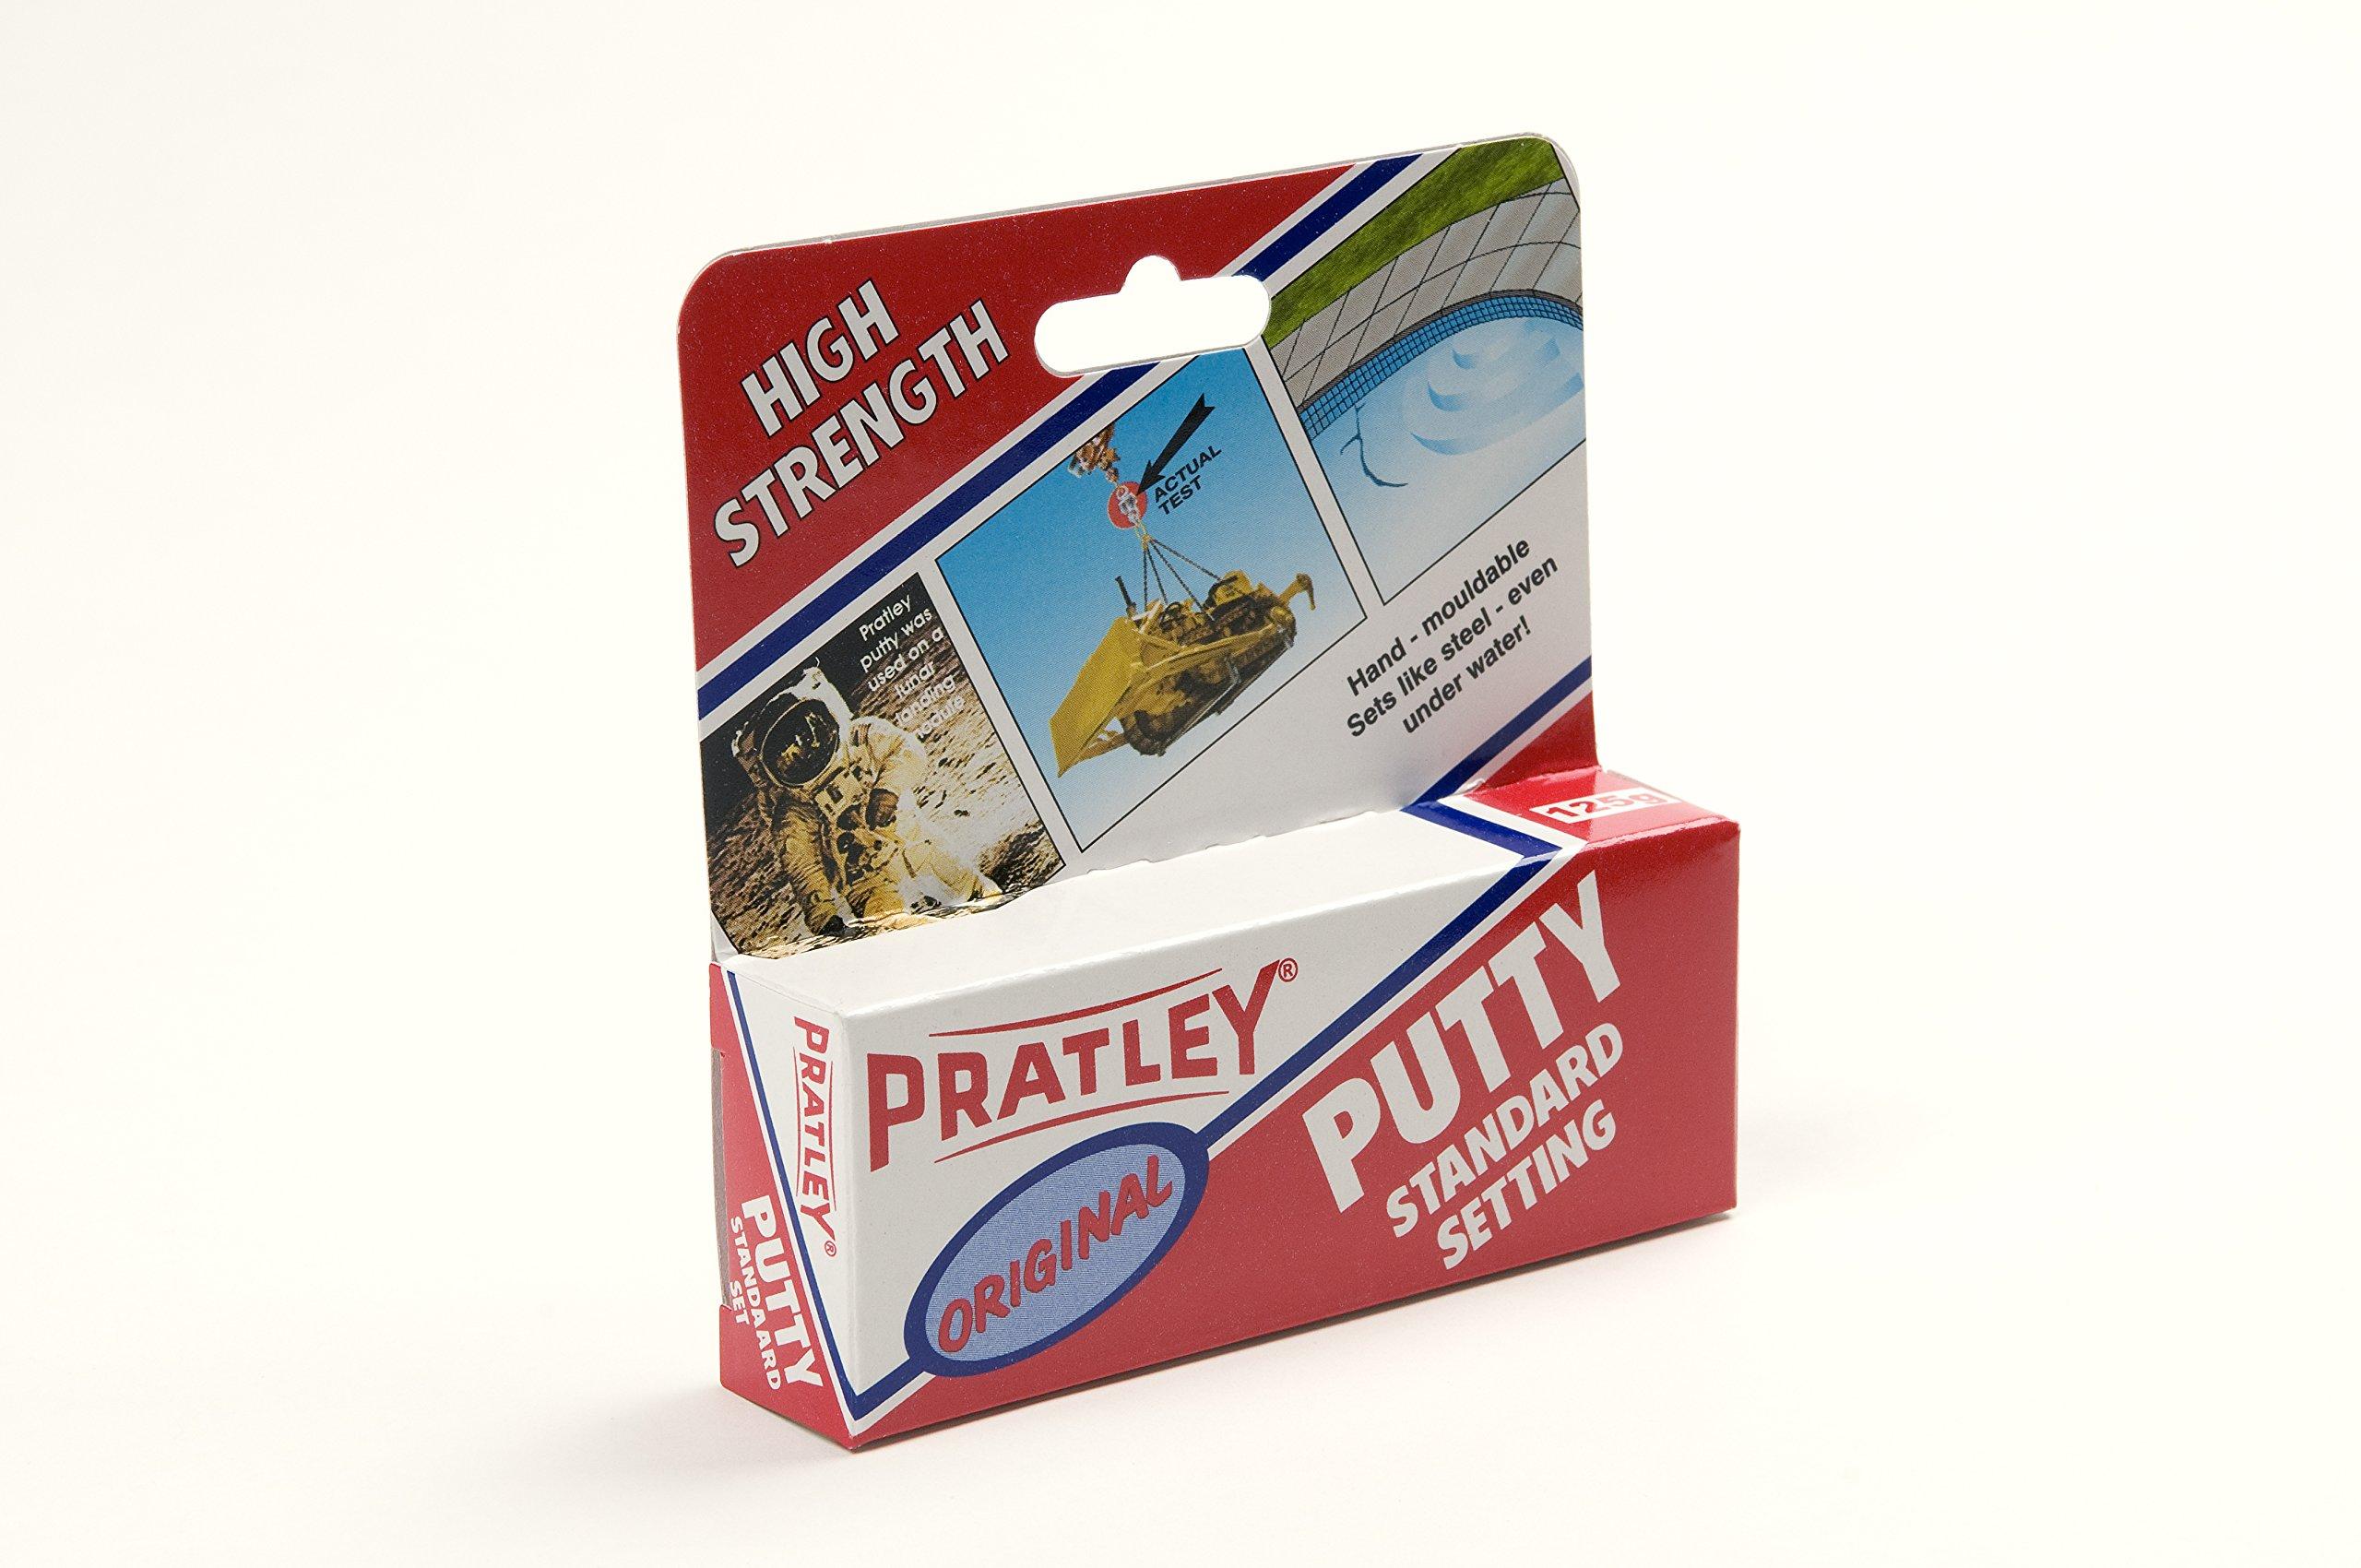 2 x Pratley Original Waterproof Adhesive Epoxy Putty 125g / 4.4 ounces 80211 New